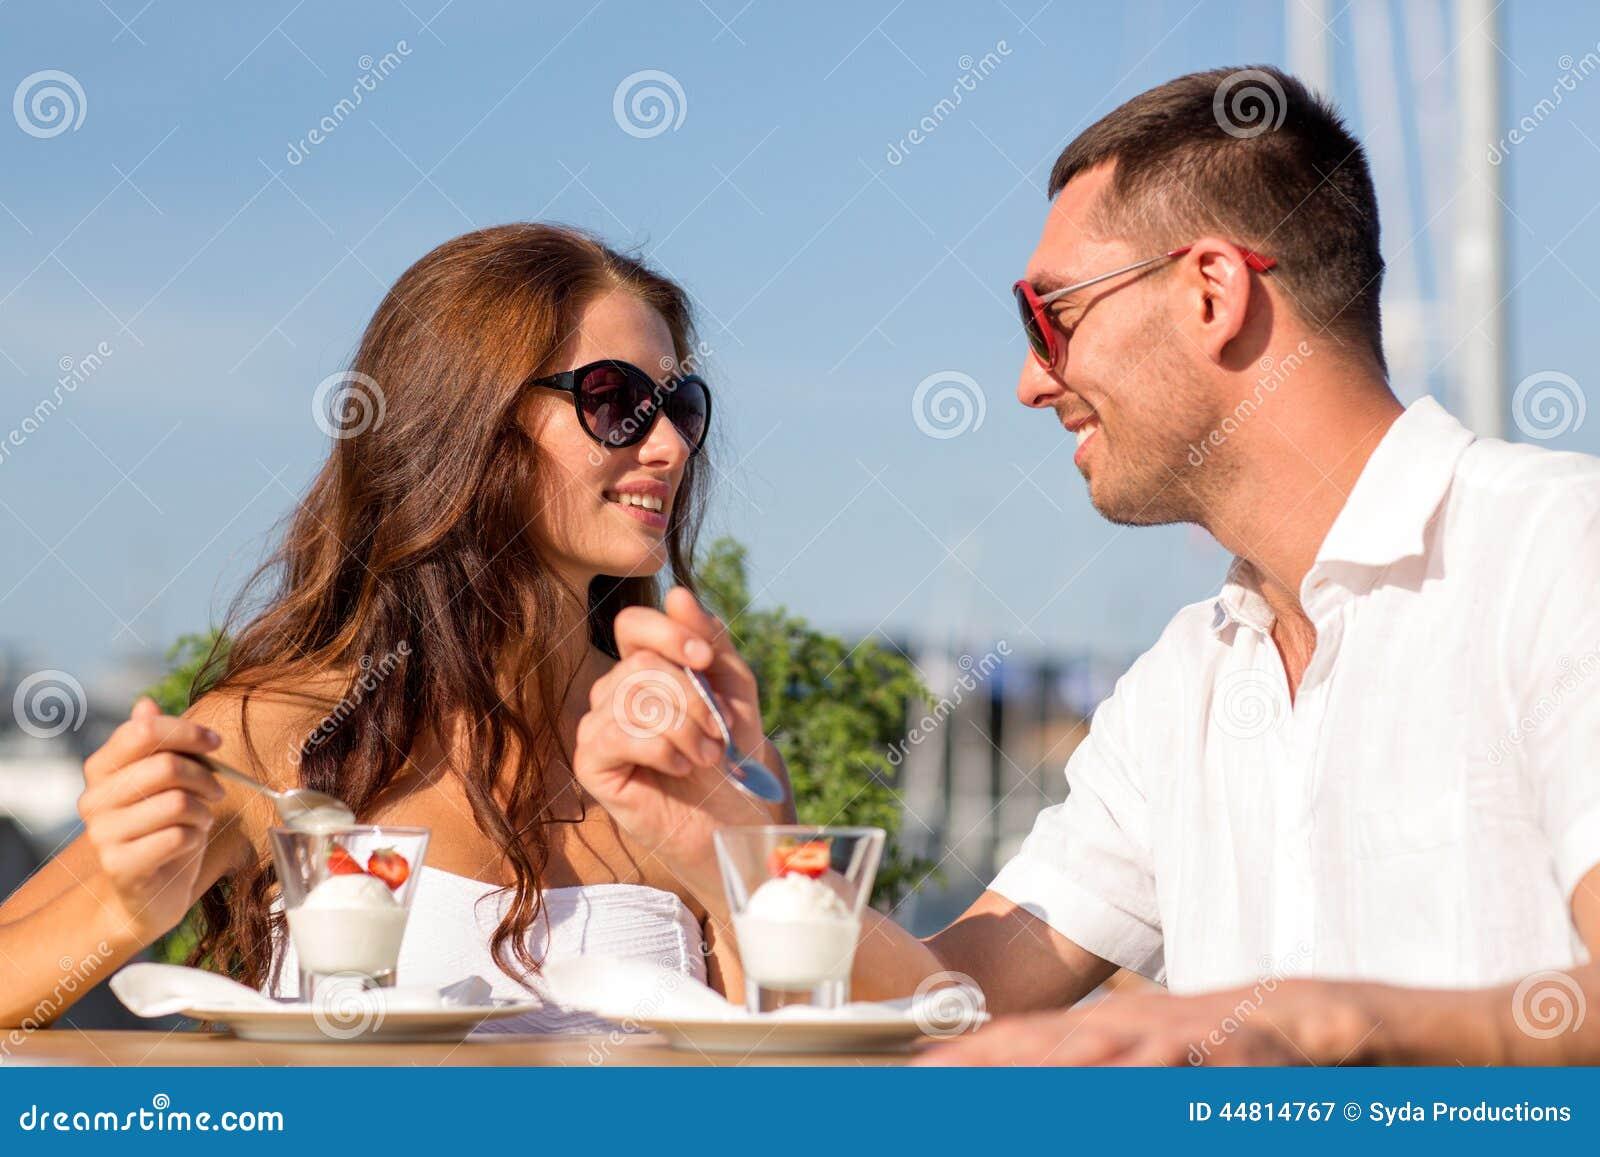 Dating cafe essen